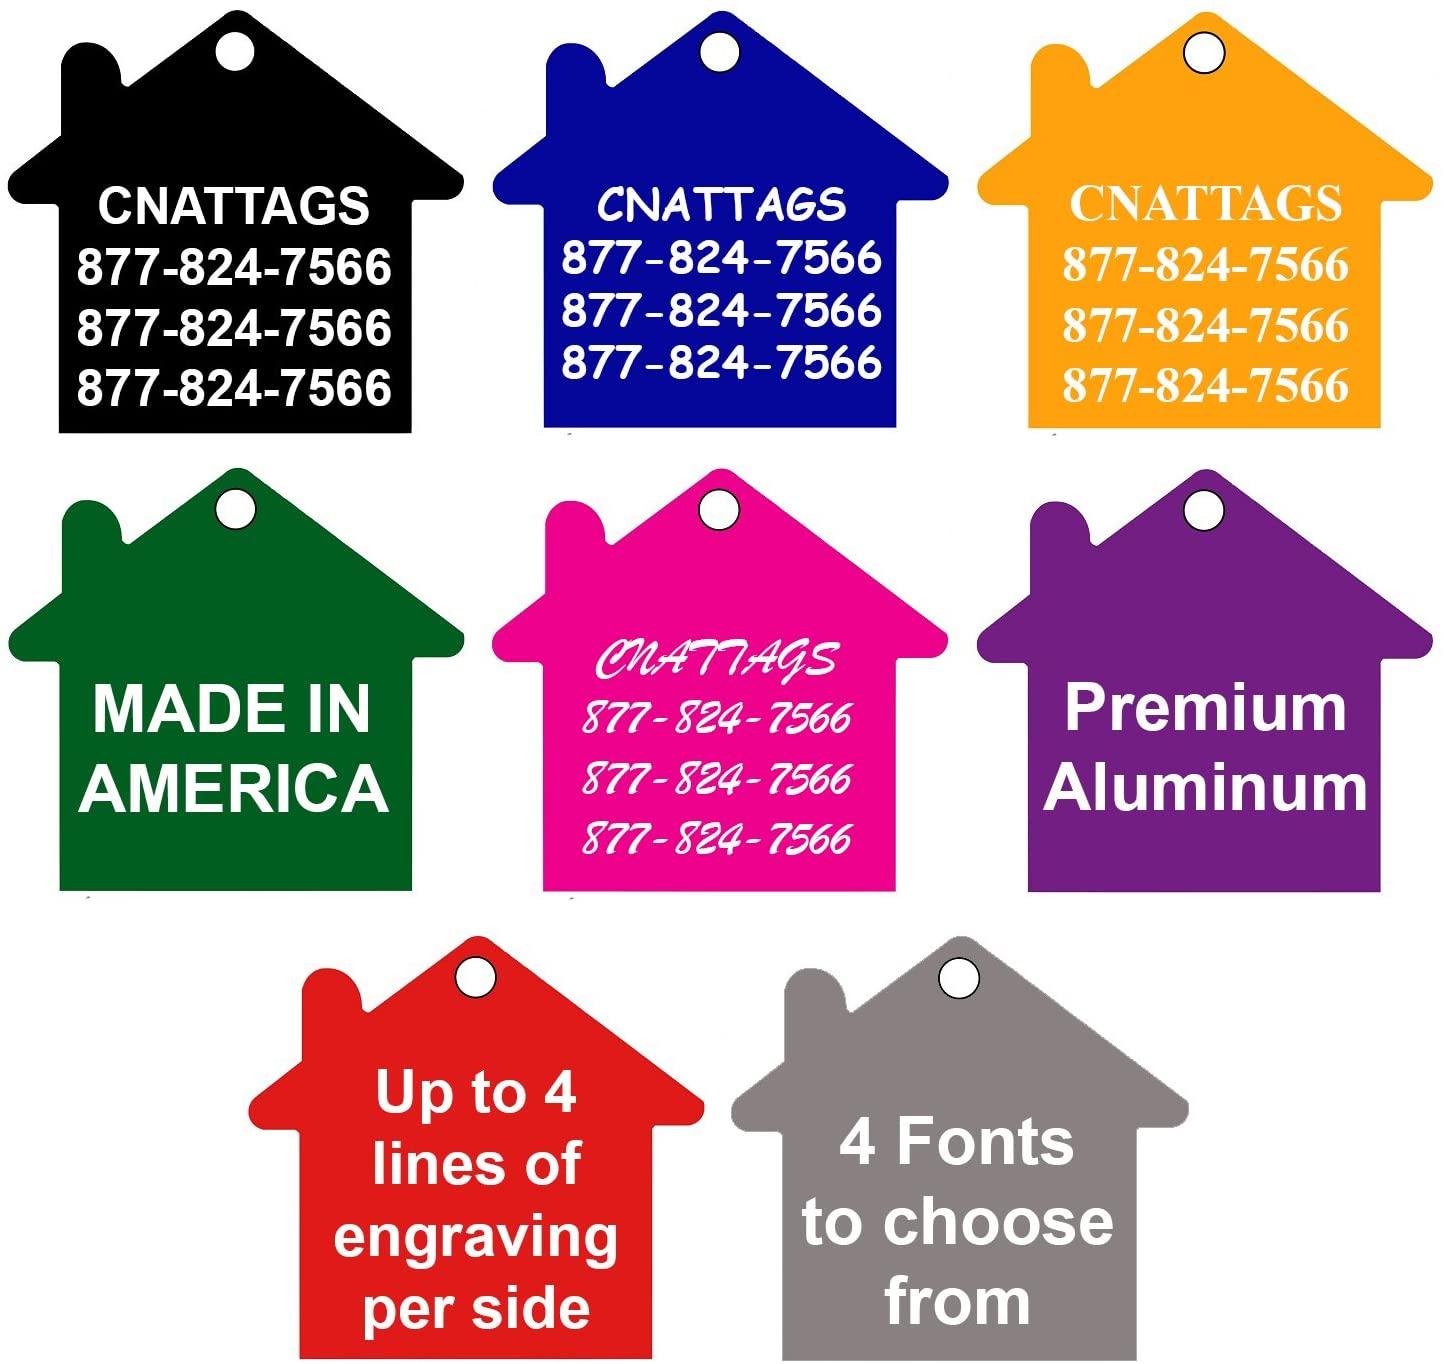 CNATTAGS Pet ID Tags House Shape, 8 Colors, Personalized Premium Aluminum